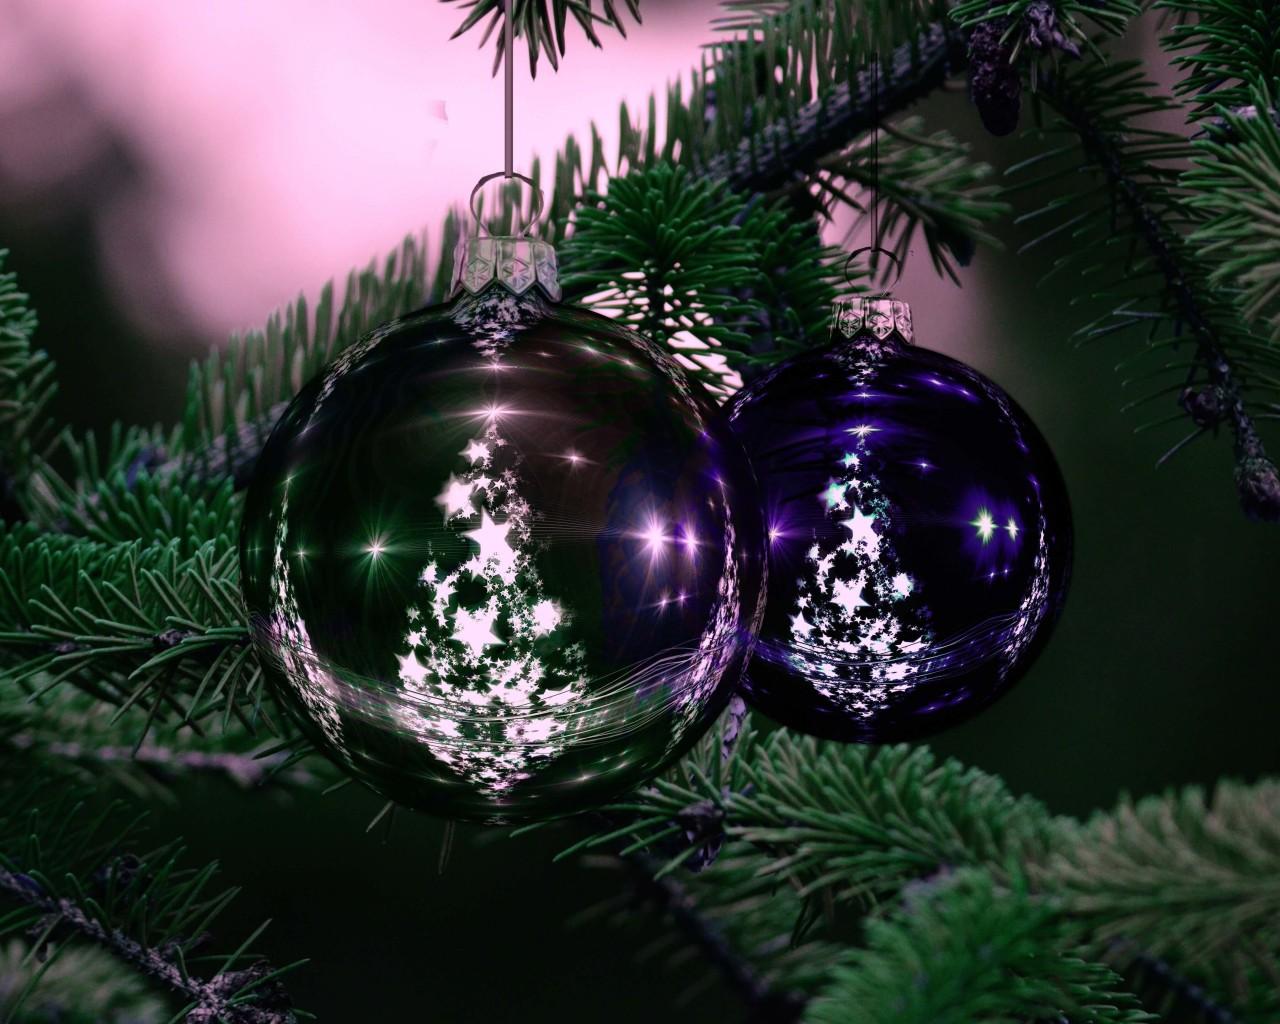 christmas tree desktop wallpaper 1280x1024 - photo #27